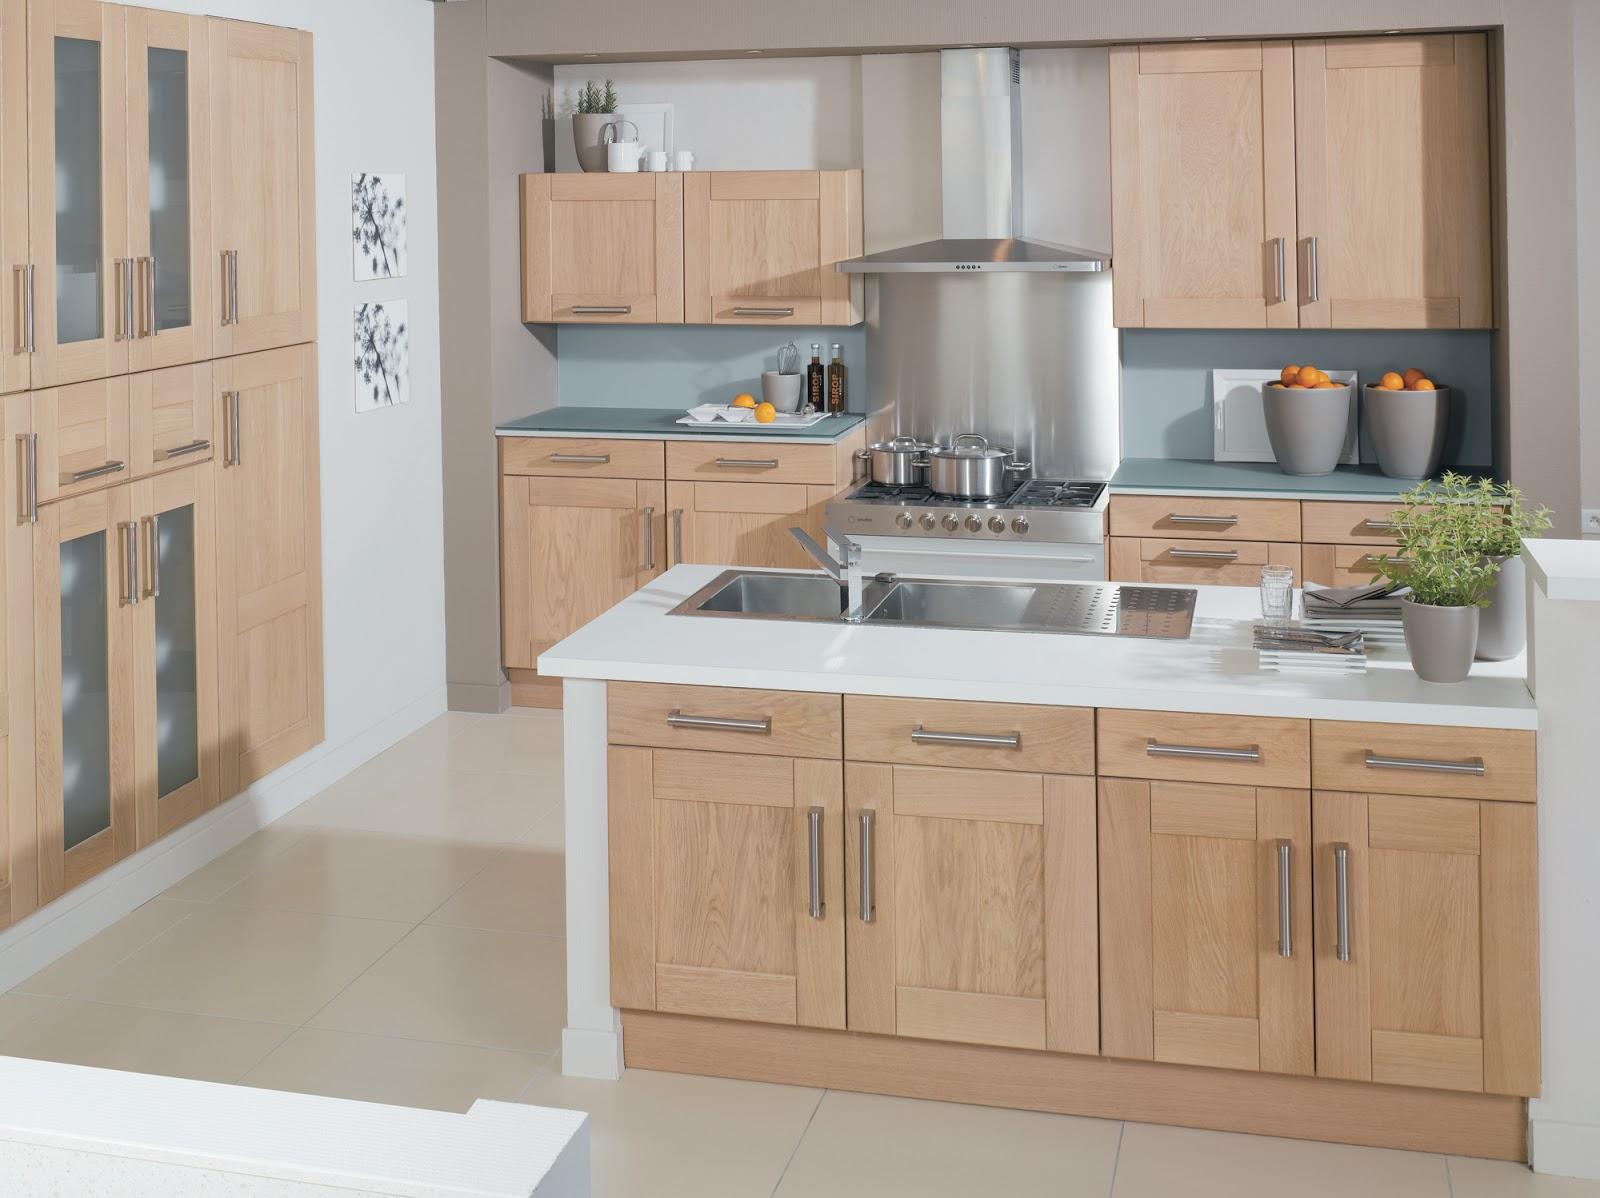 485634 penmie bee. Black Bedroom Furniture Sets. Home Design Ideas